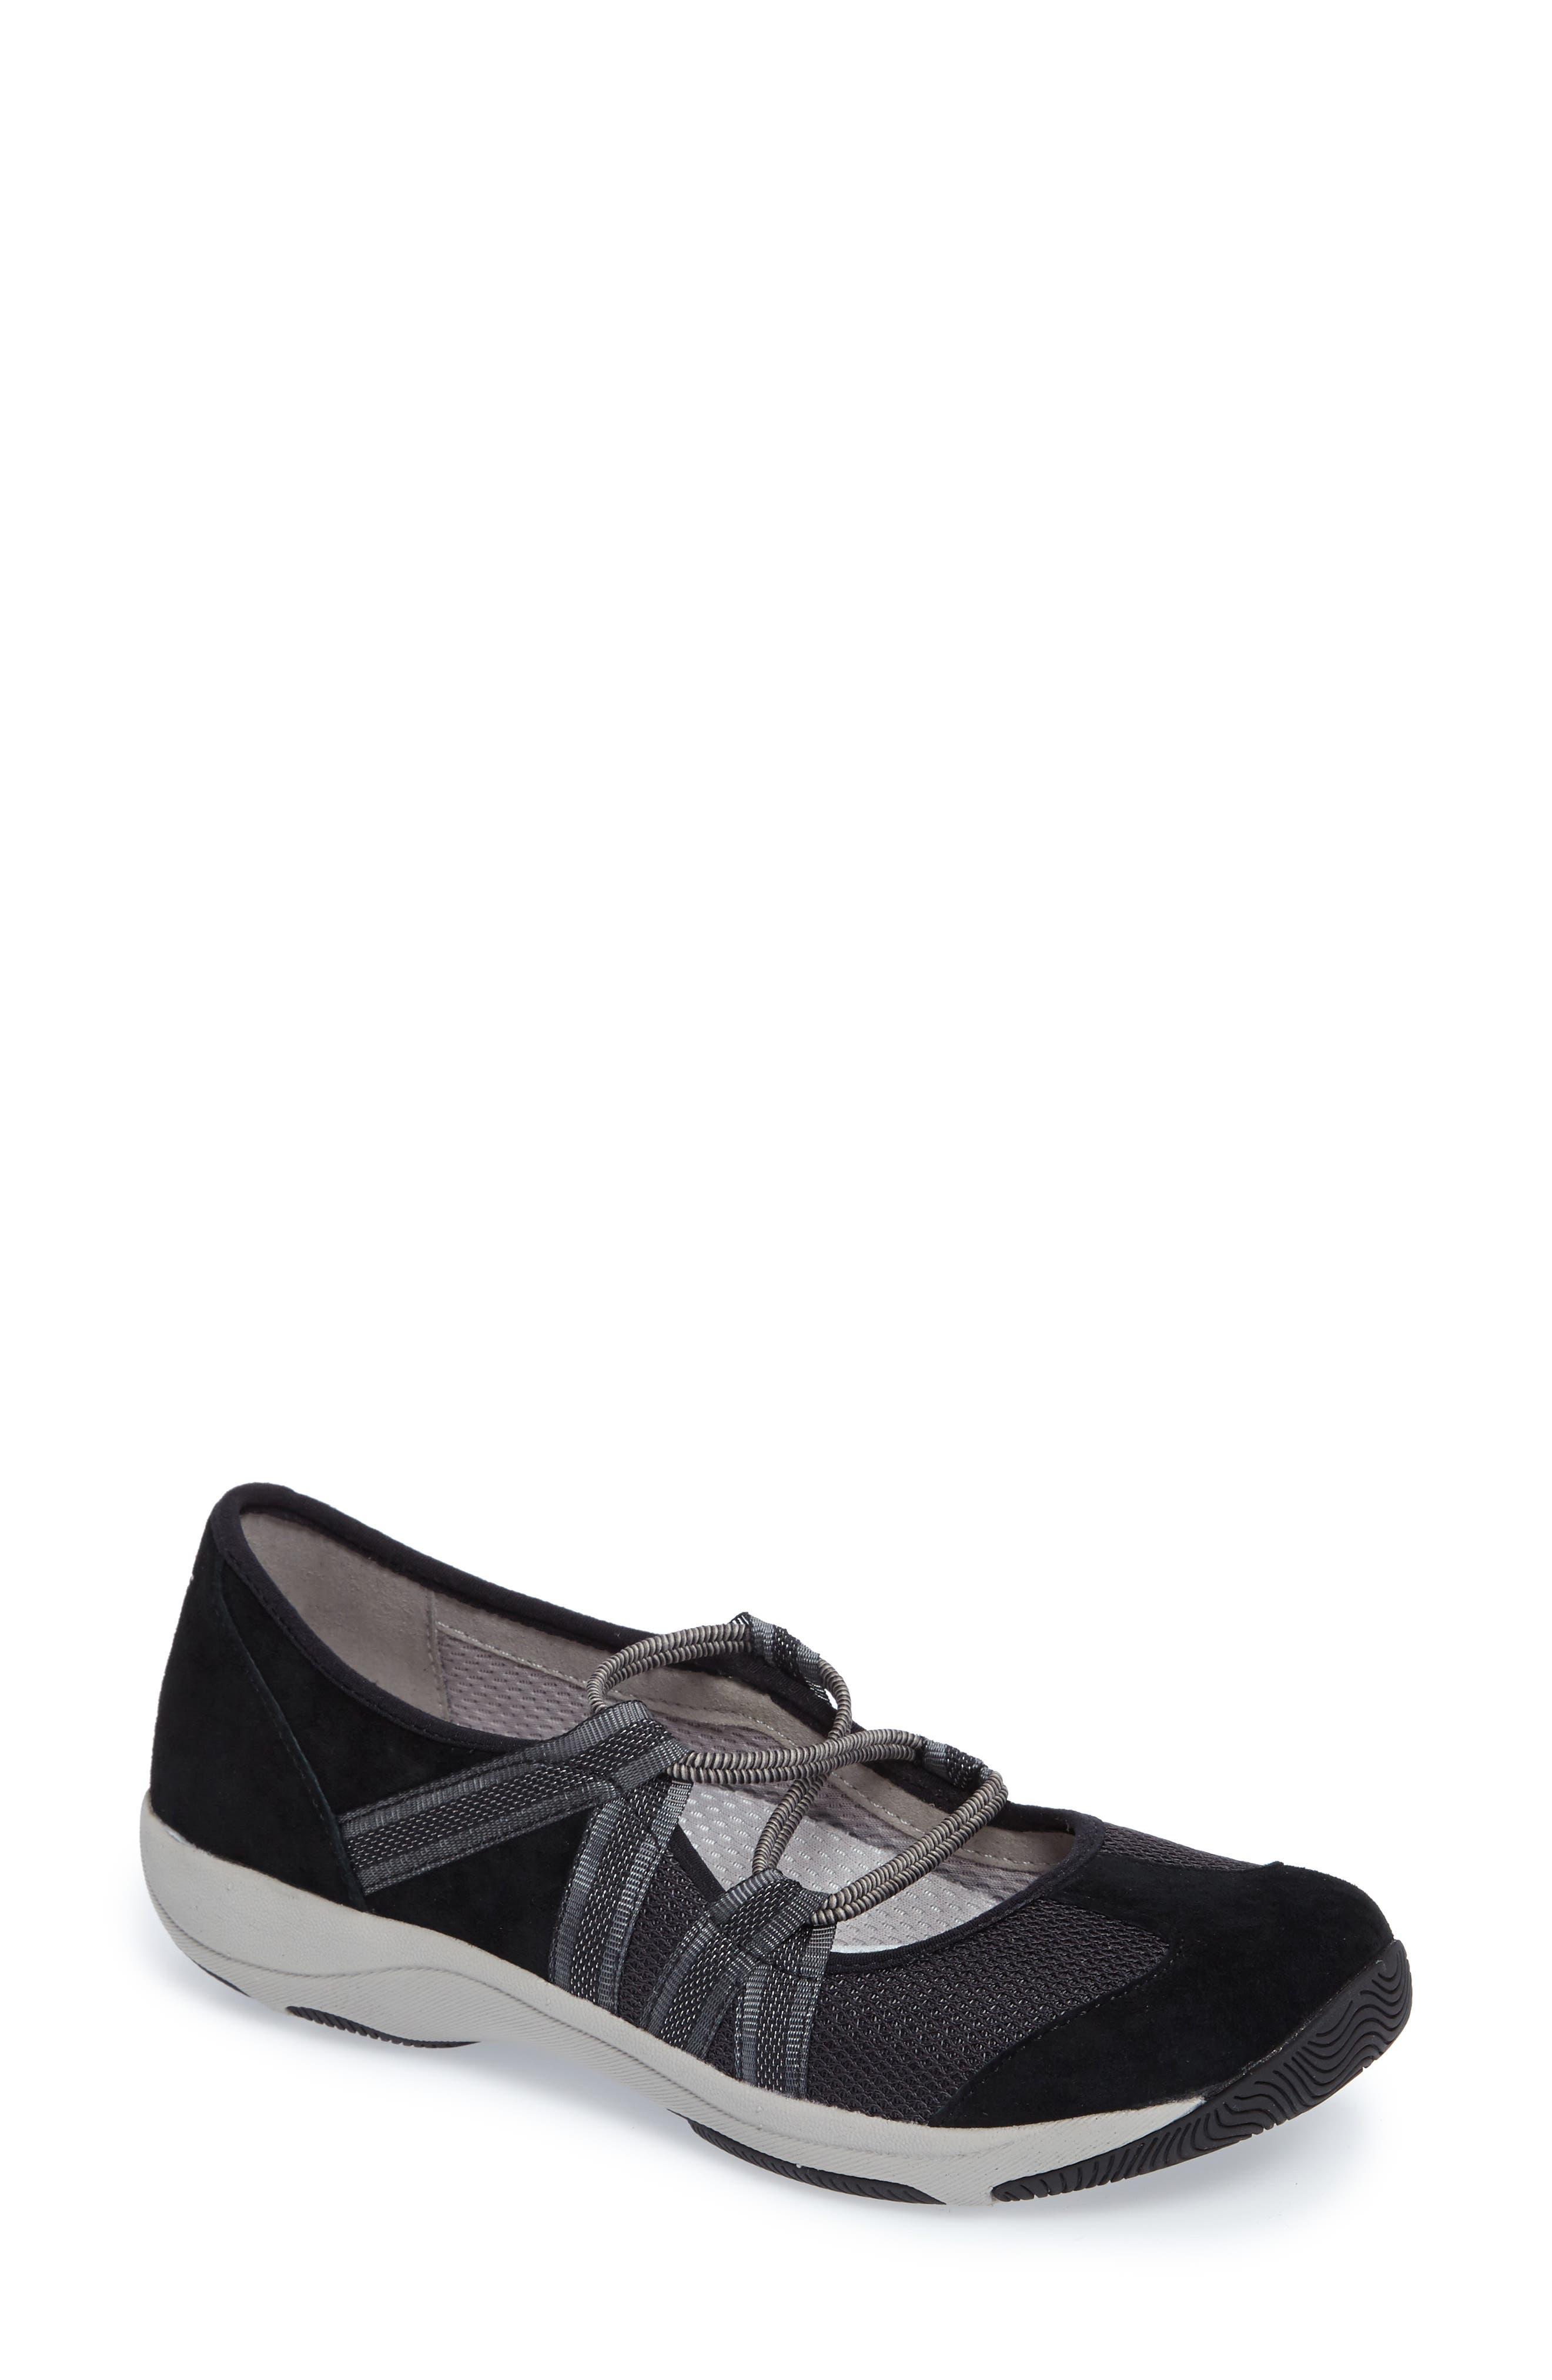 Honey Slip-On Sneaker,                         Main,                         color, Black Suede